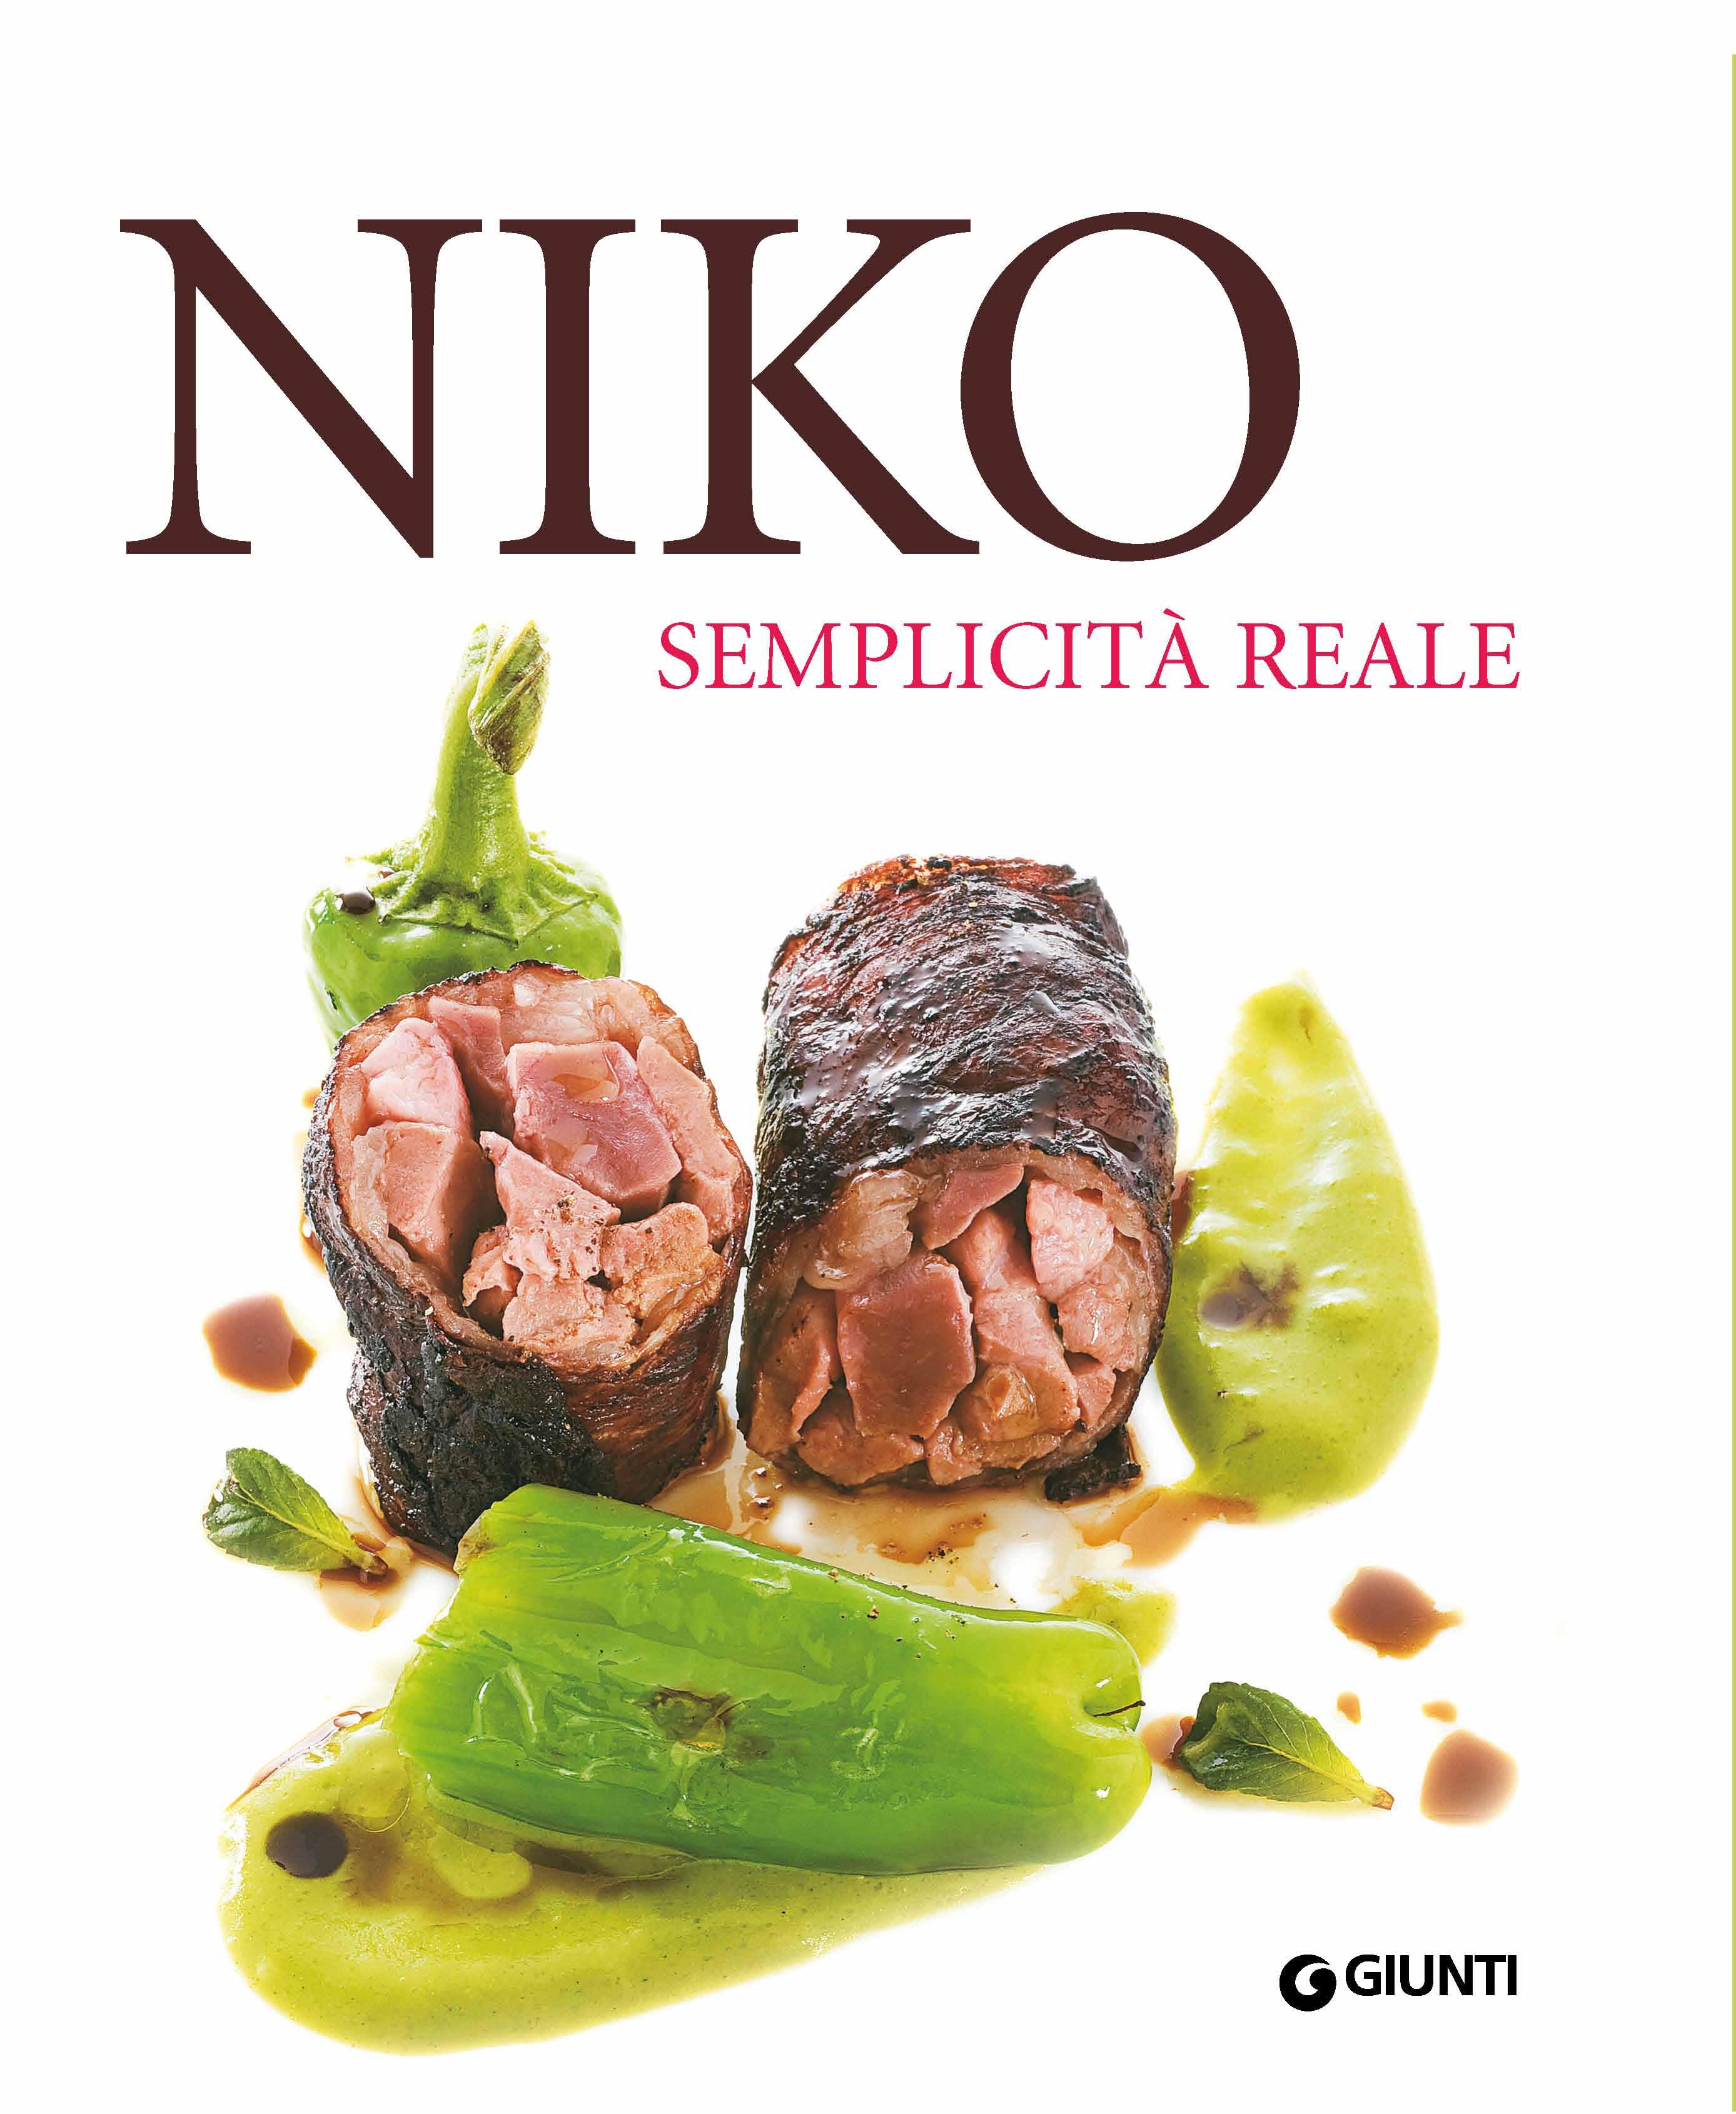 Copertina Niko, semplicità reale